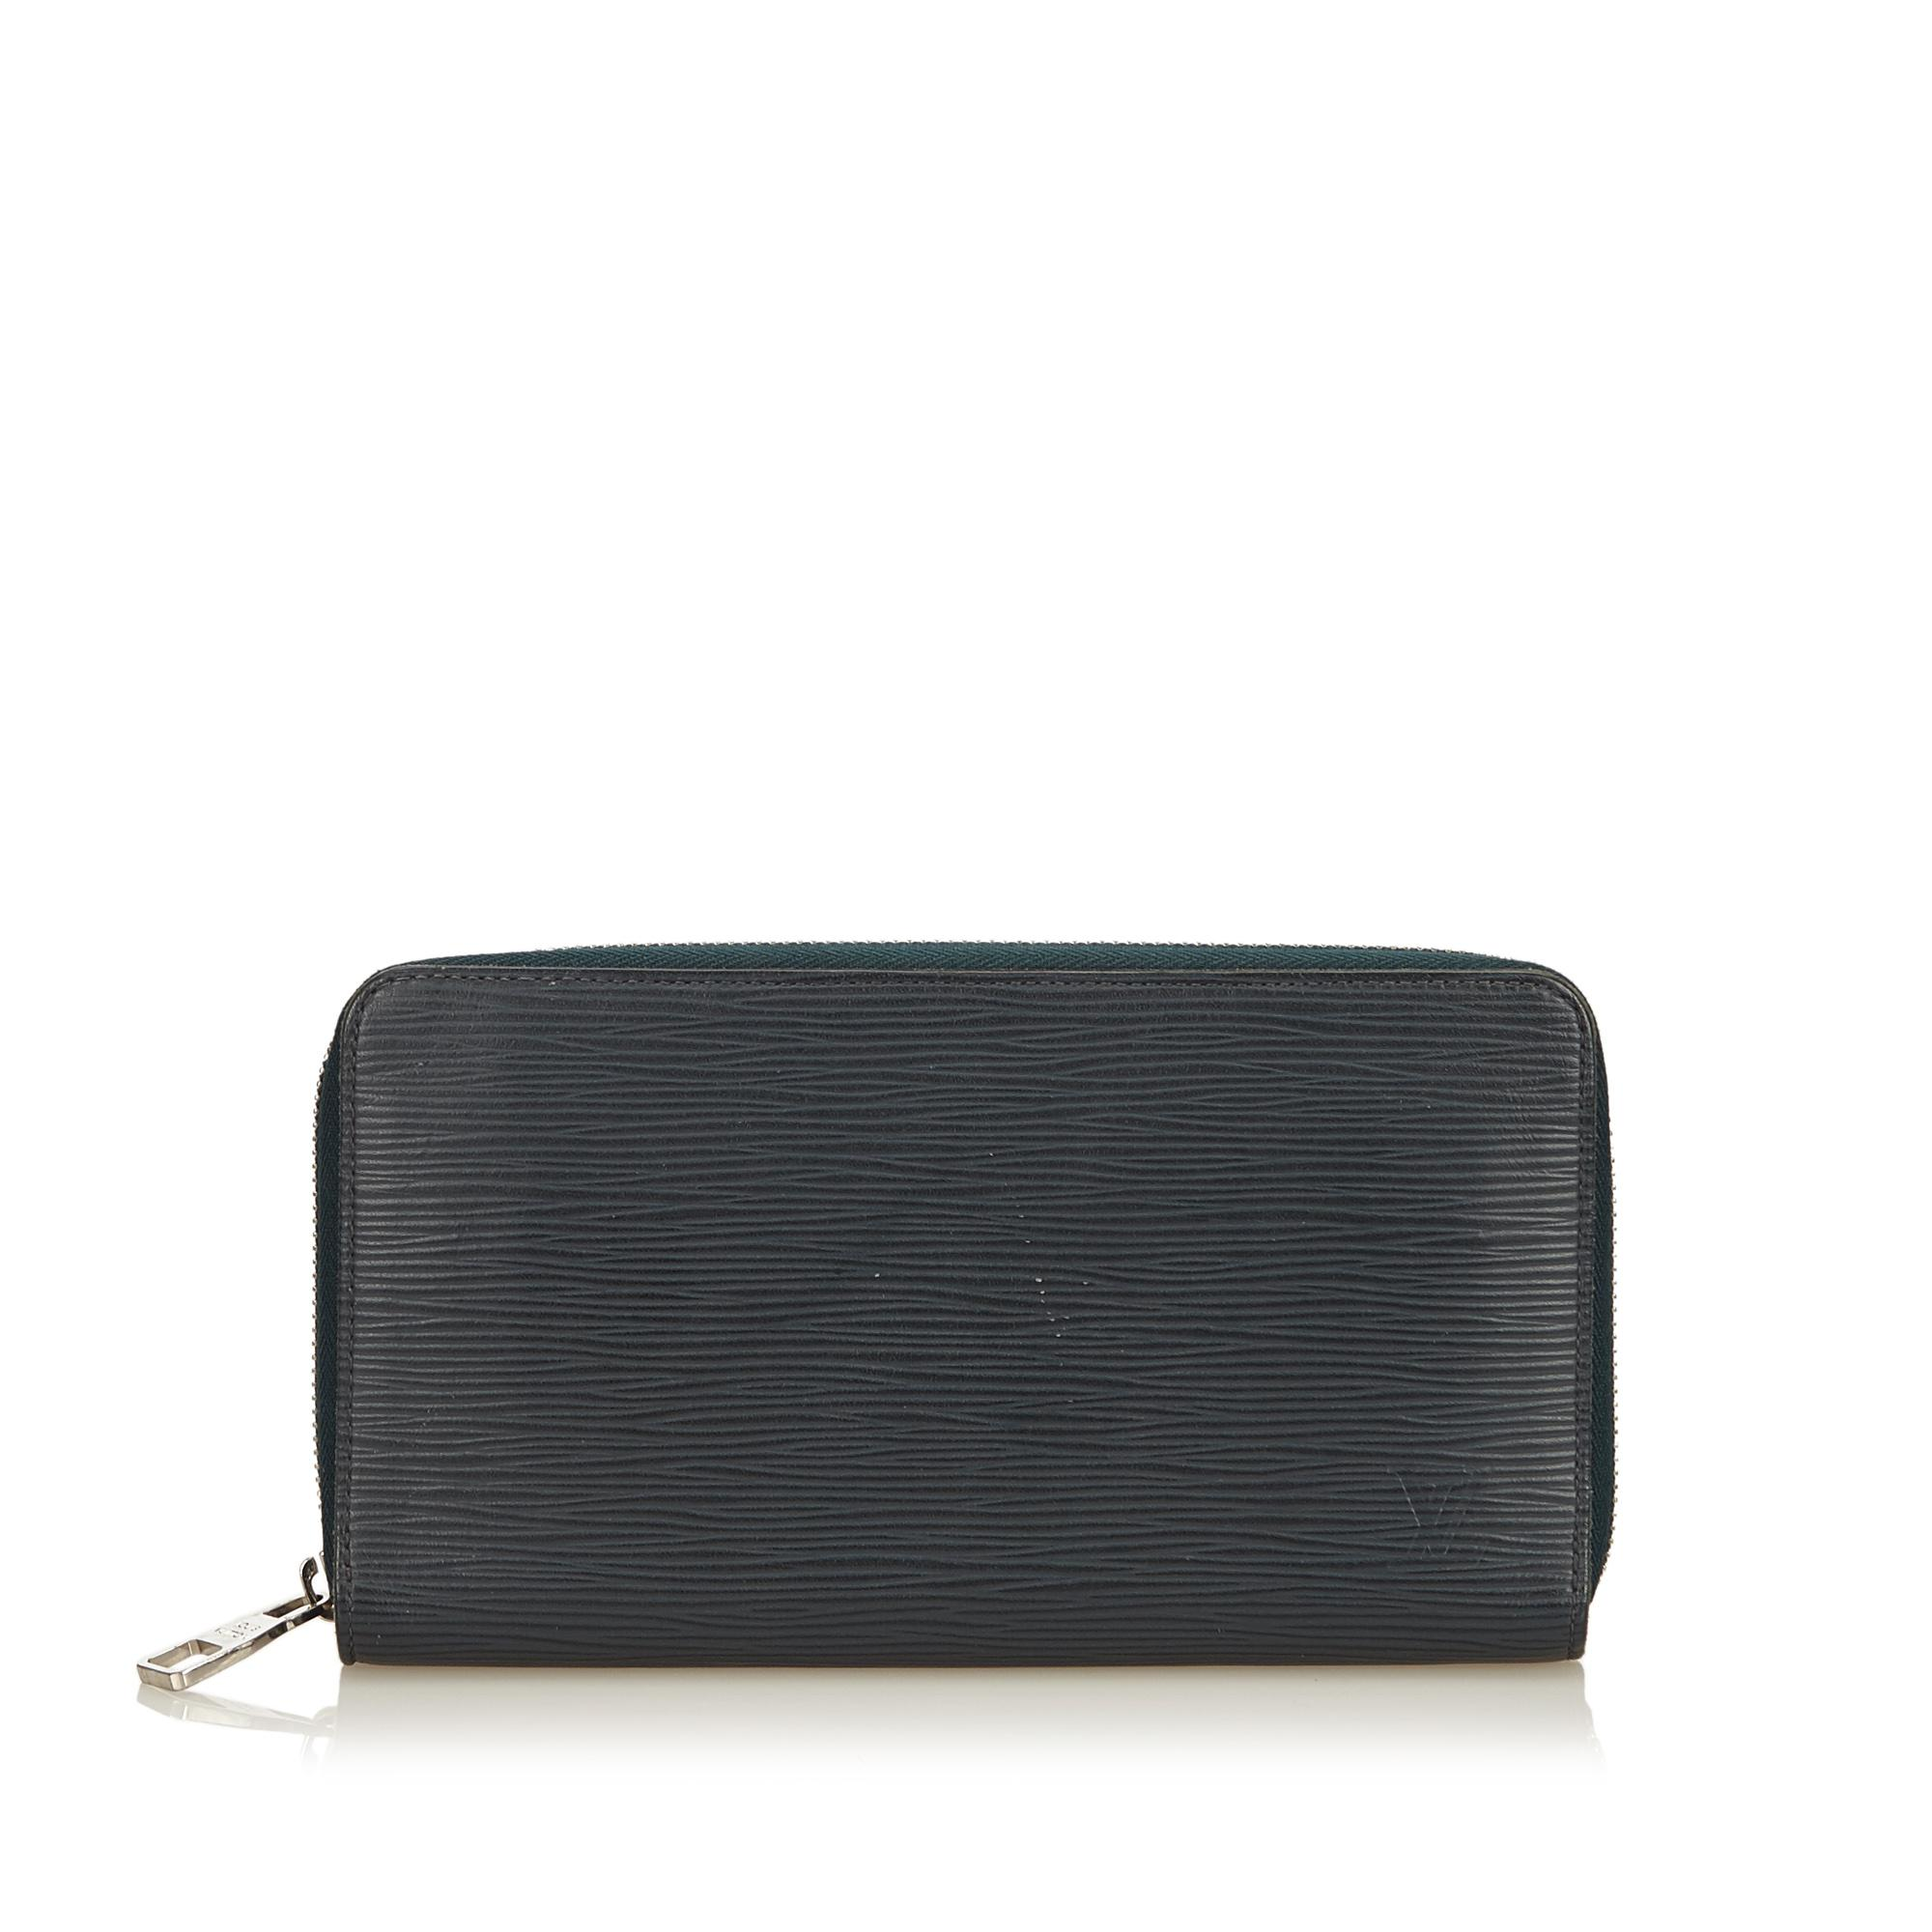 Lyst - Louis Vuitton Epi Zippy Wallet in Black 2959fc7c50e